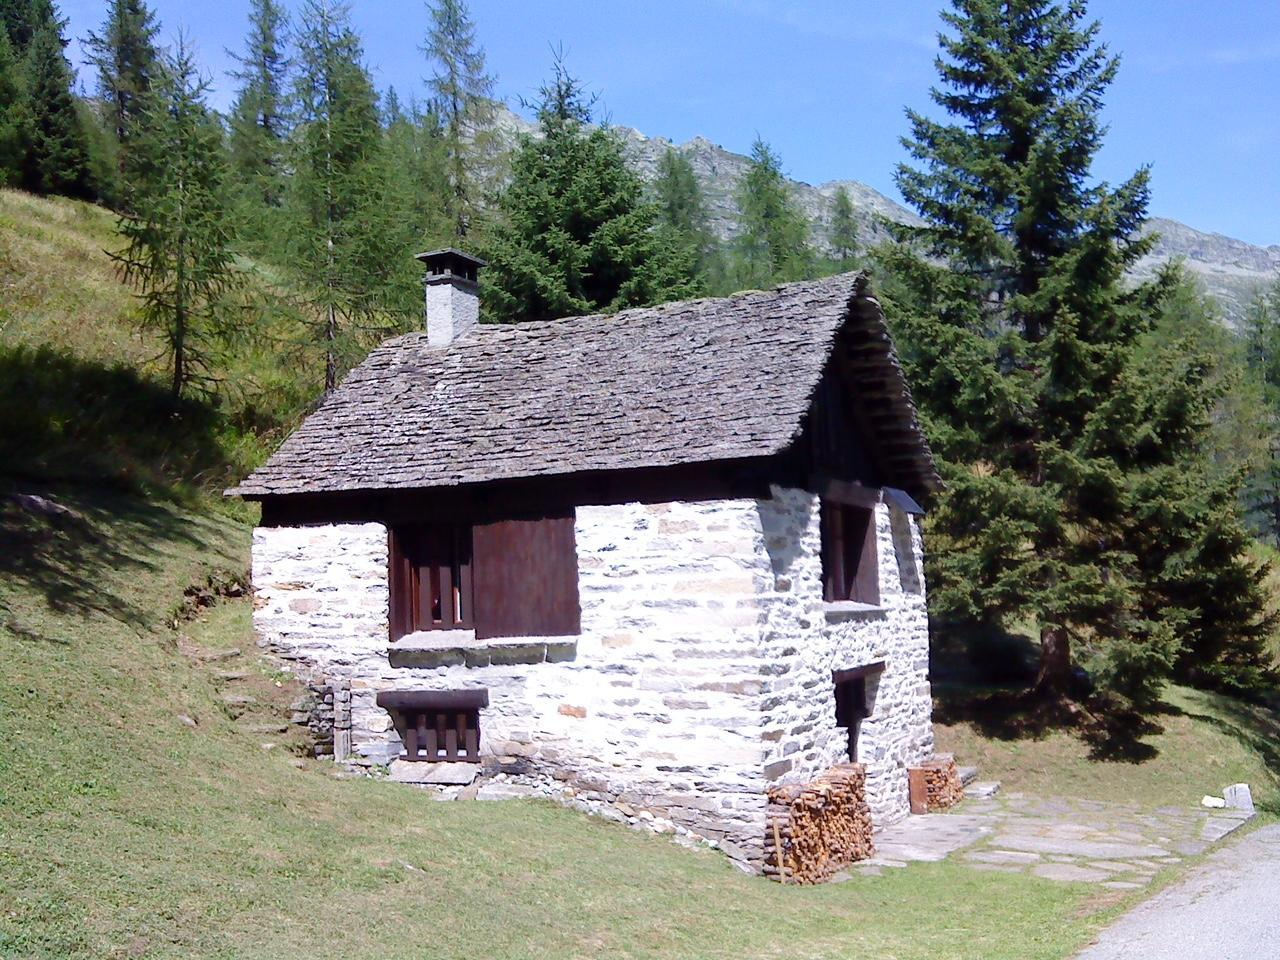 Ferienhaus Rustico Bersacola (2529672), Bosco Gurin, Maggiatal, Tessin, Schweiz, Bild 7